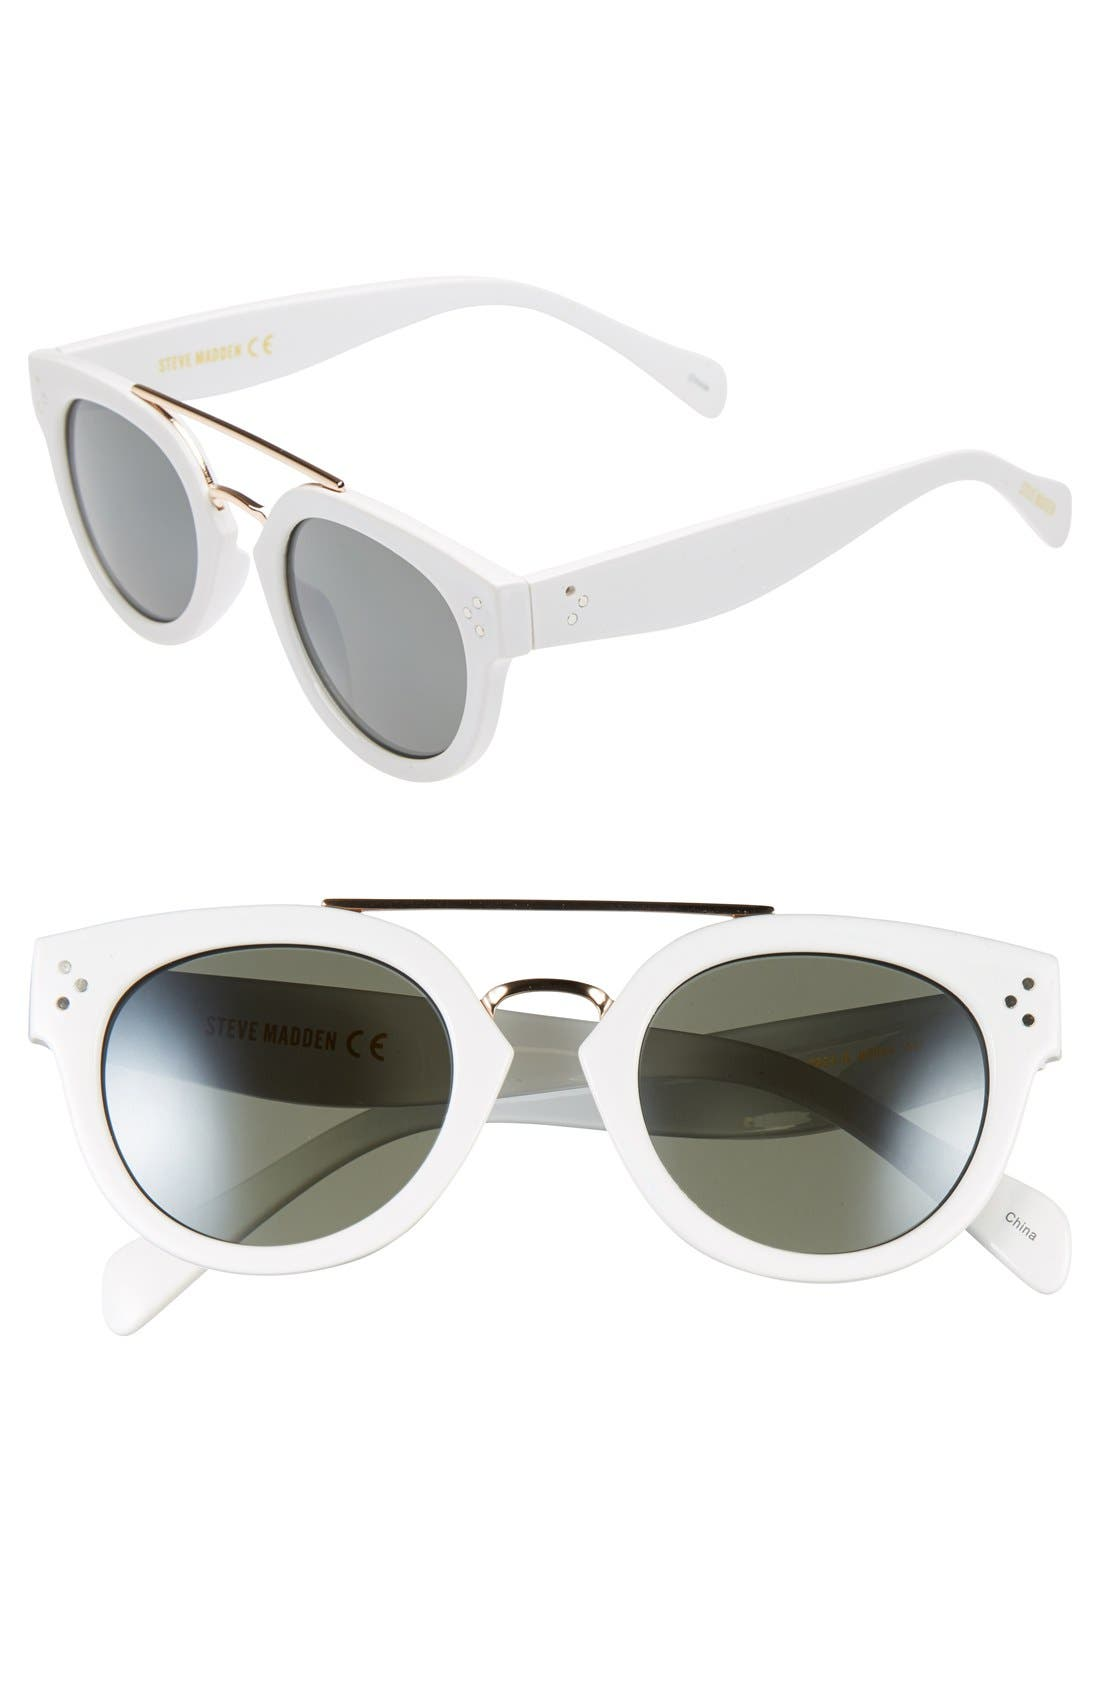 Main Image - Steve Madden 48mm Metal Brow Bar Round Sunglasses